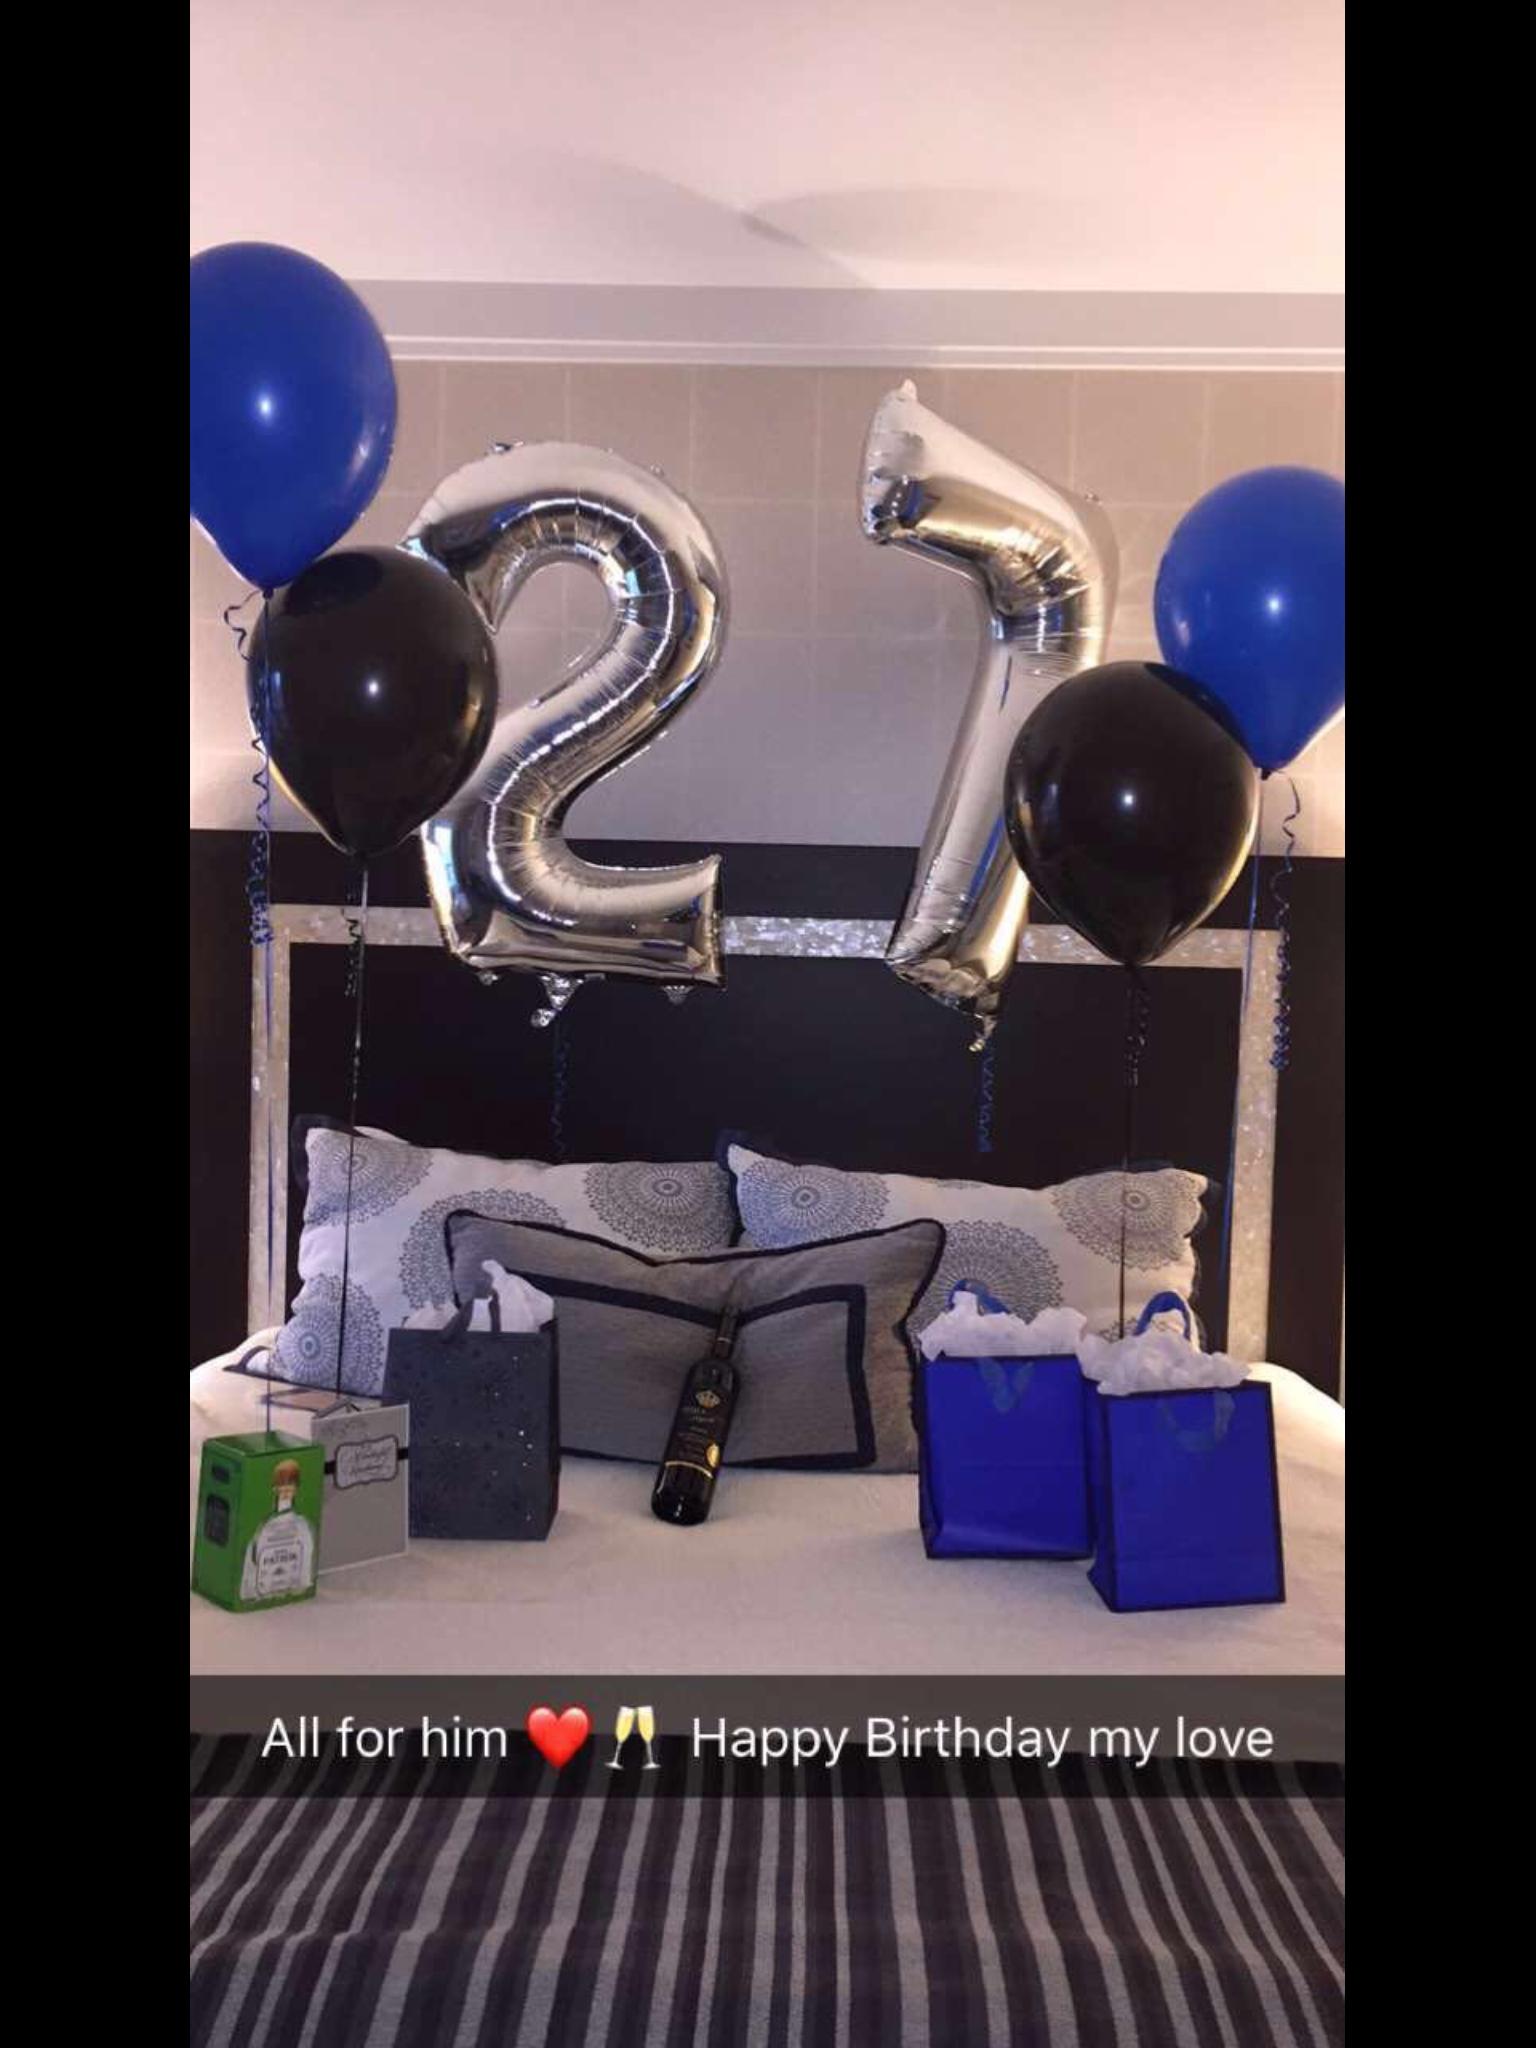 10 Stylish Surprise Birthday Ideas For Boyfriend birthday surprise for him e29da4 boyfriends pinterest jay 2 2020